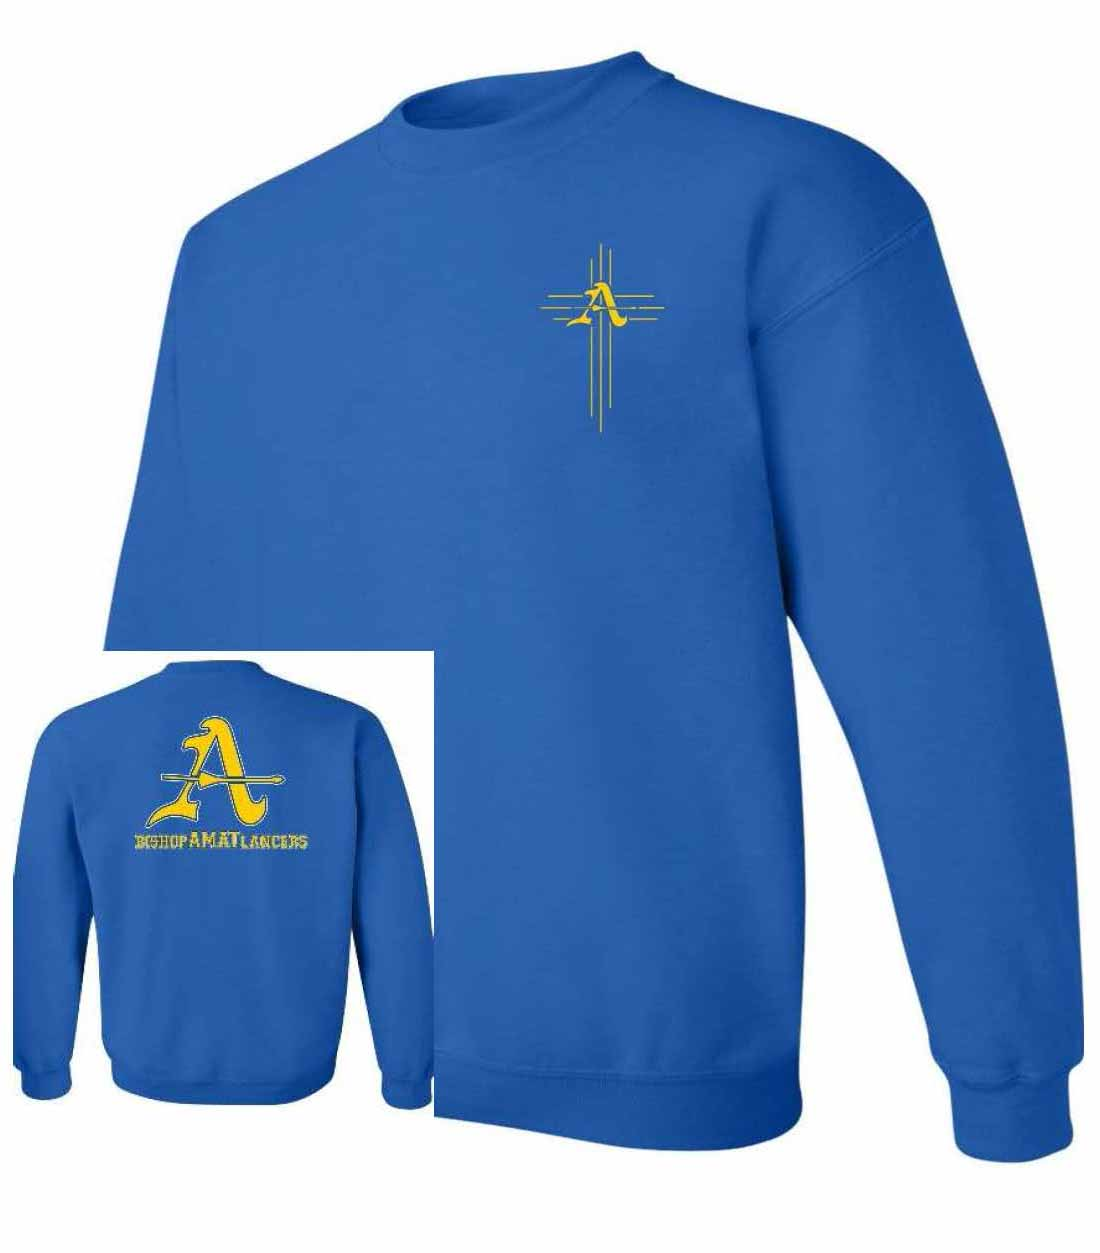 Blue Crew Sweatshirt